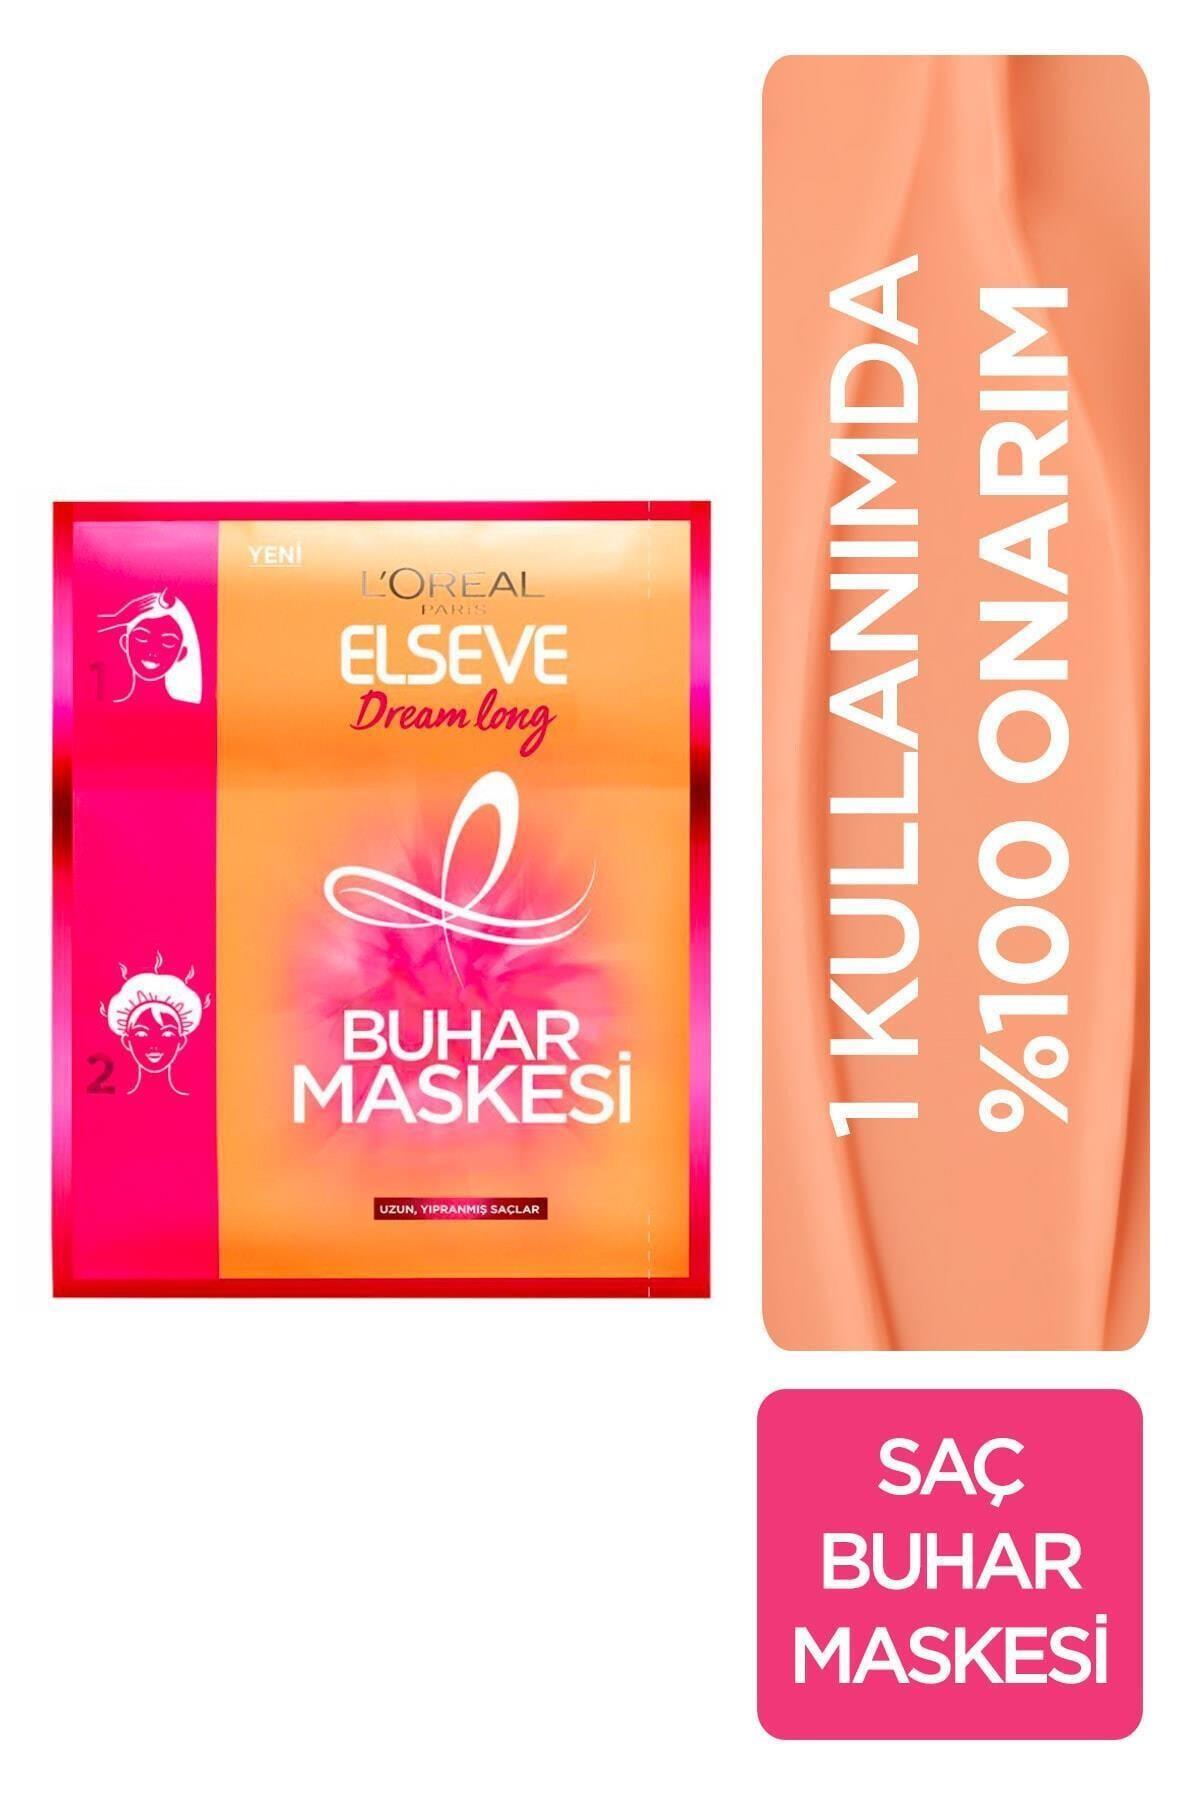 ELSEVE Dream Long Buhar Maskesi 3600523626205 1